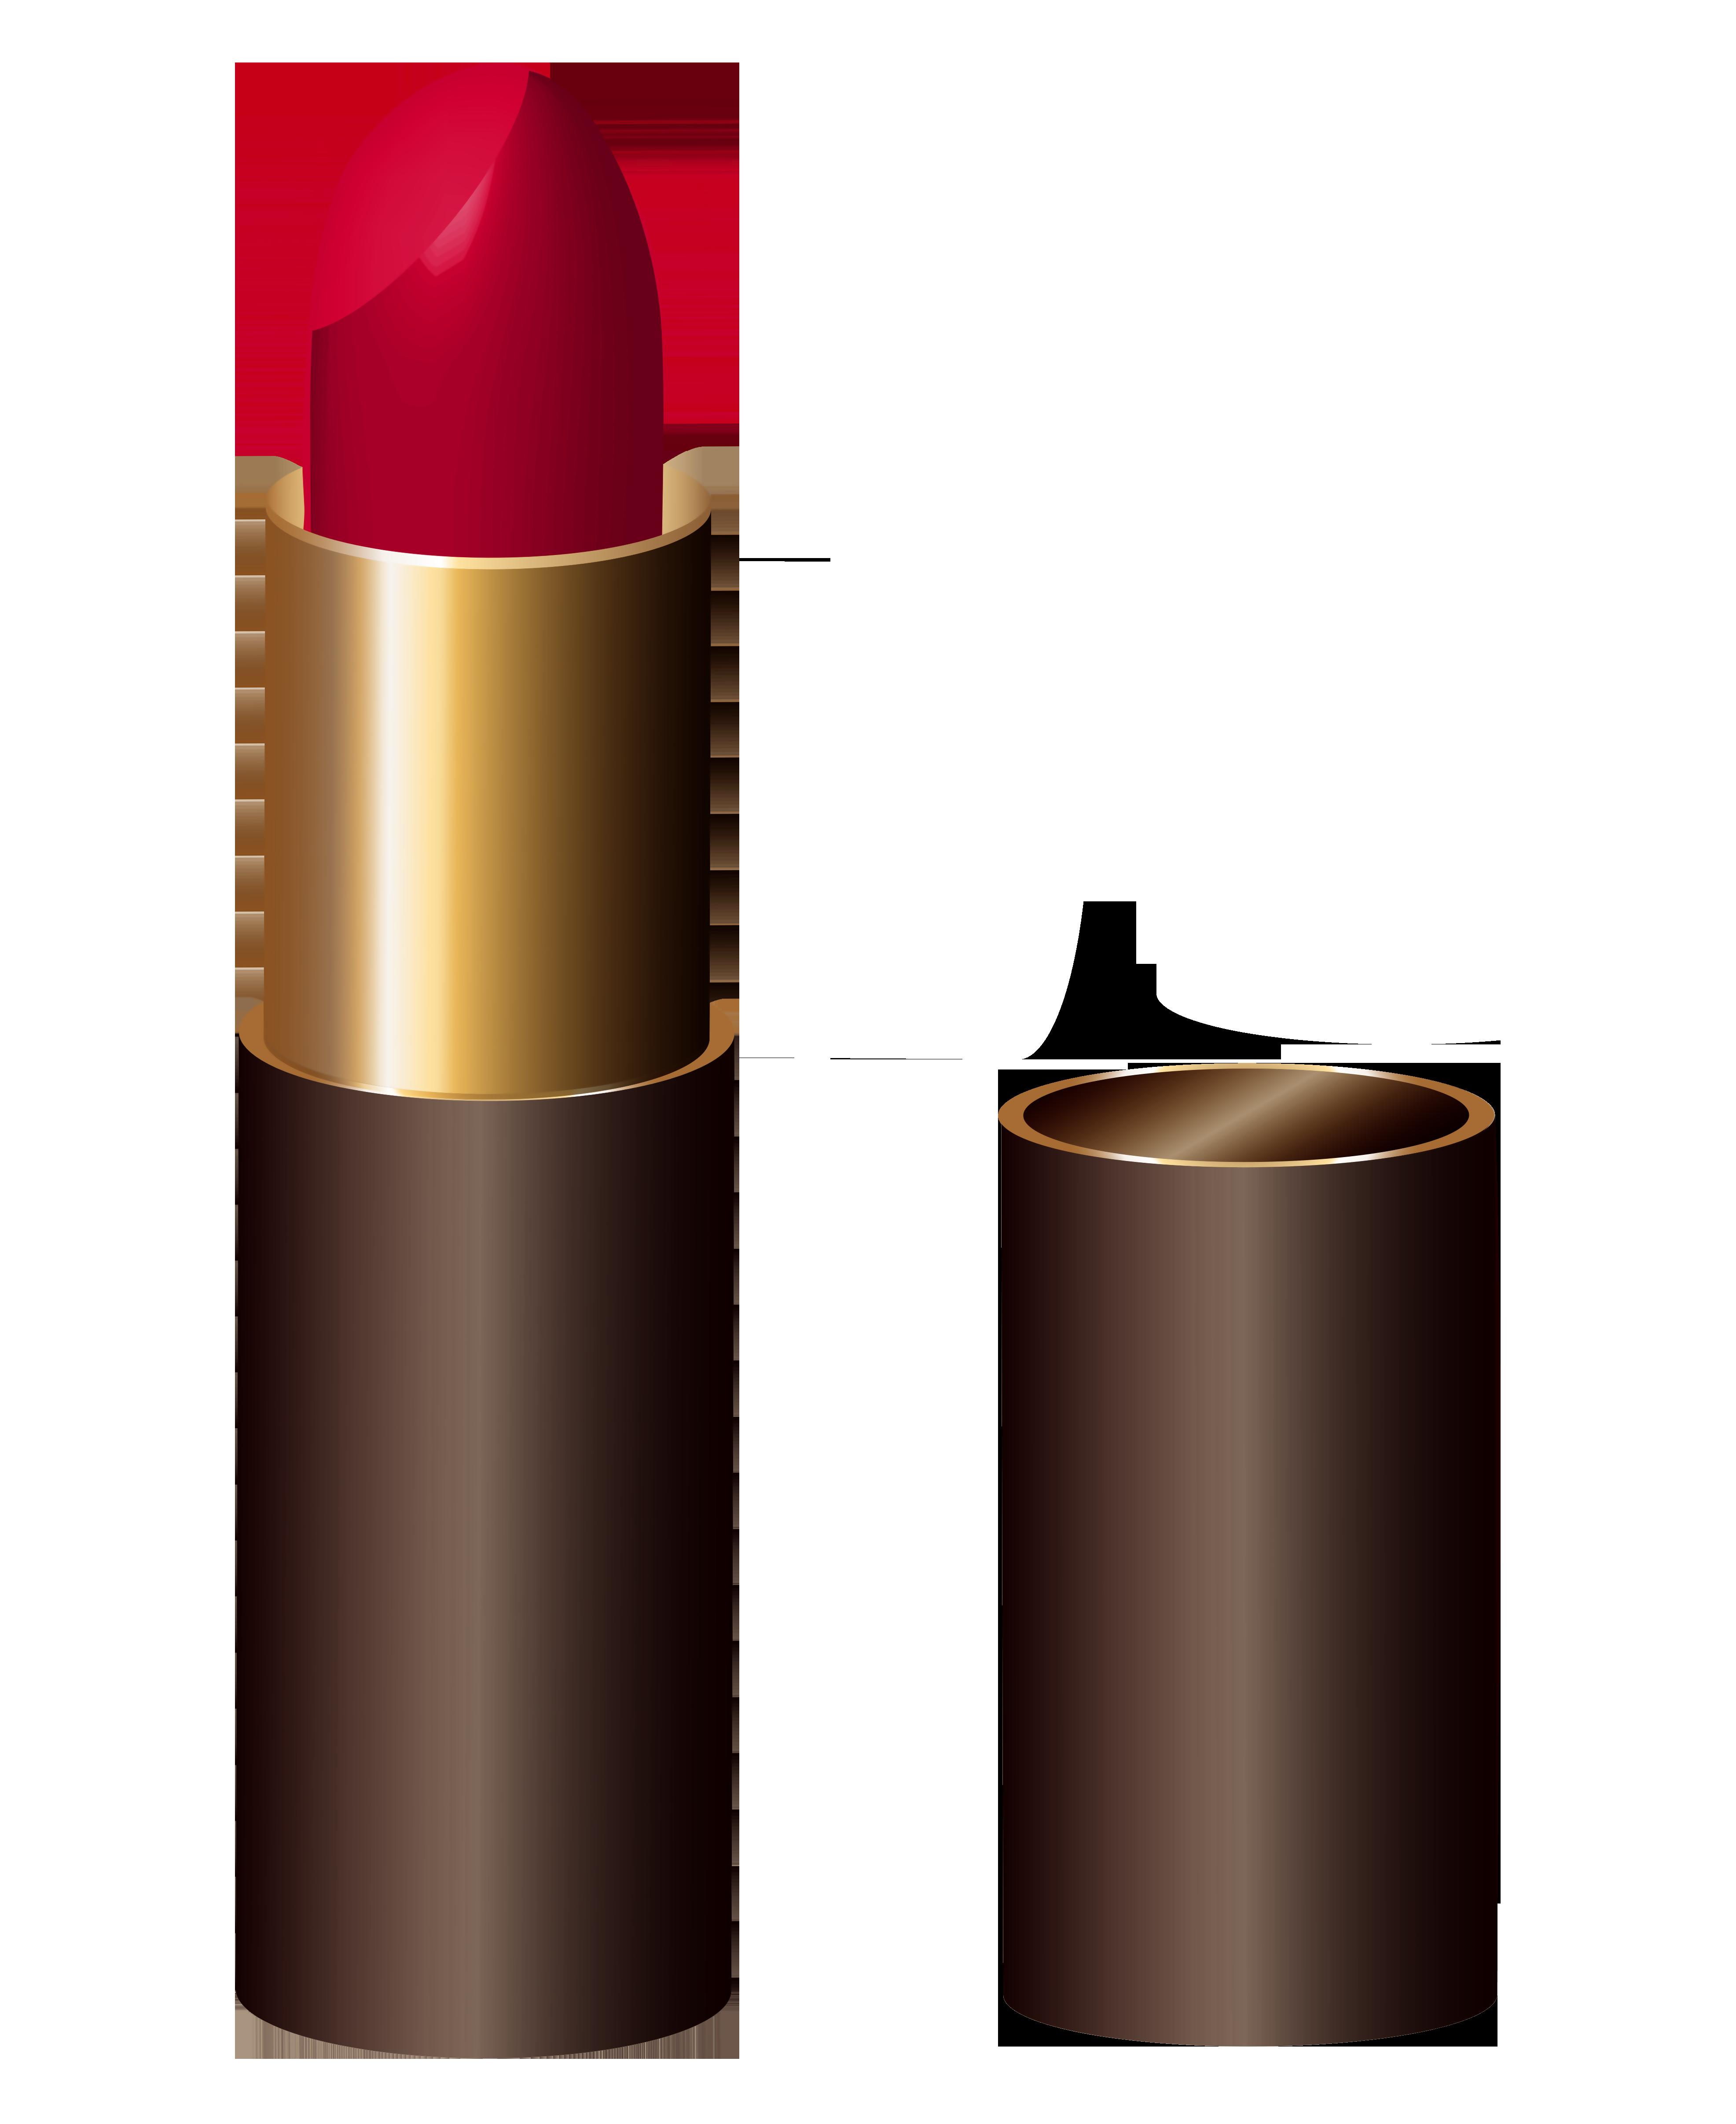 Lipstick Clipart & Lipstick Clip Art Images.